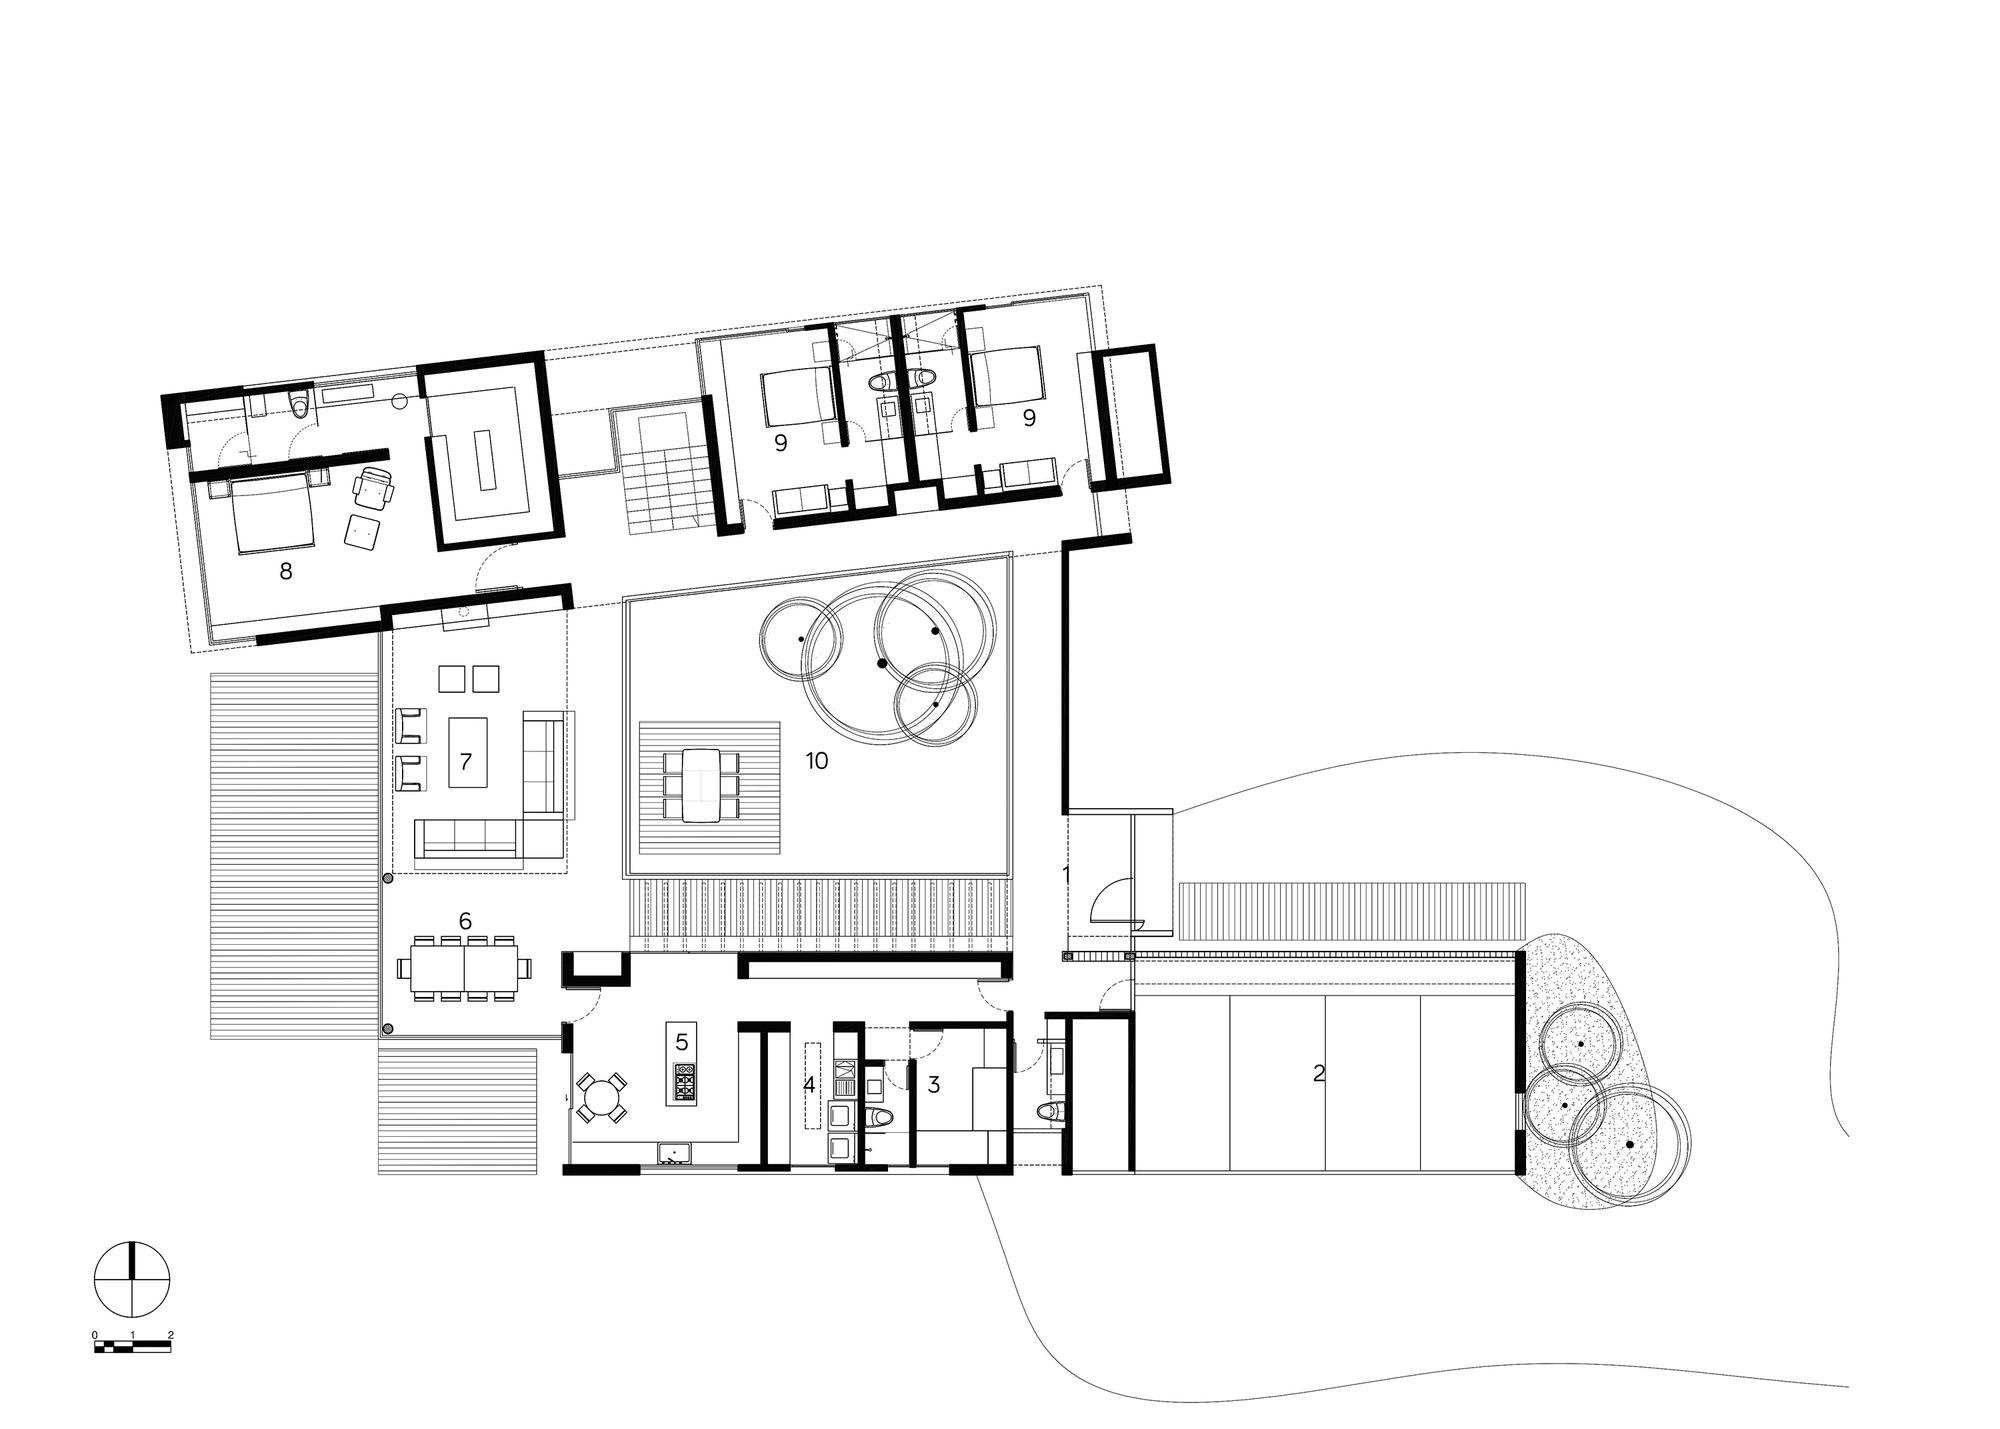 Galeria de casa 5 arquitectura en estudio 13 - Estudios de arquitectura en tenerife ...